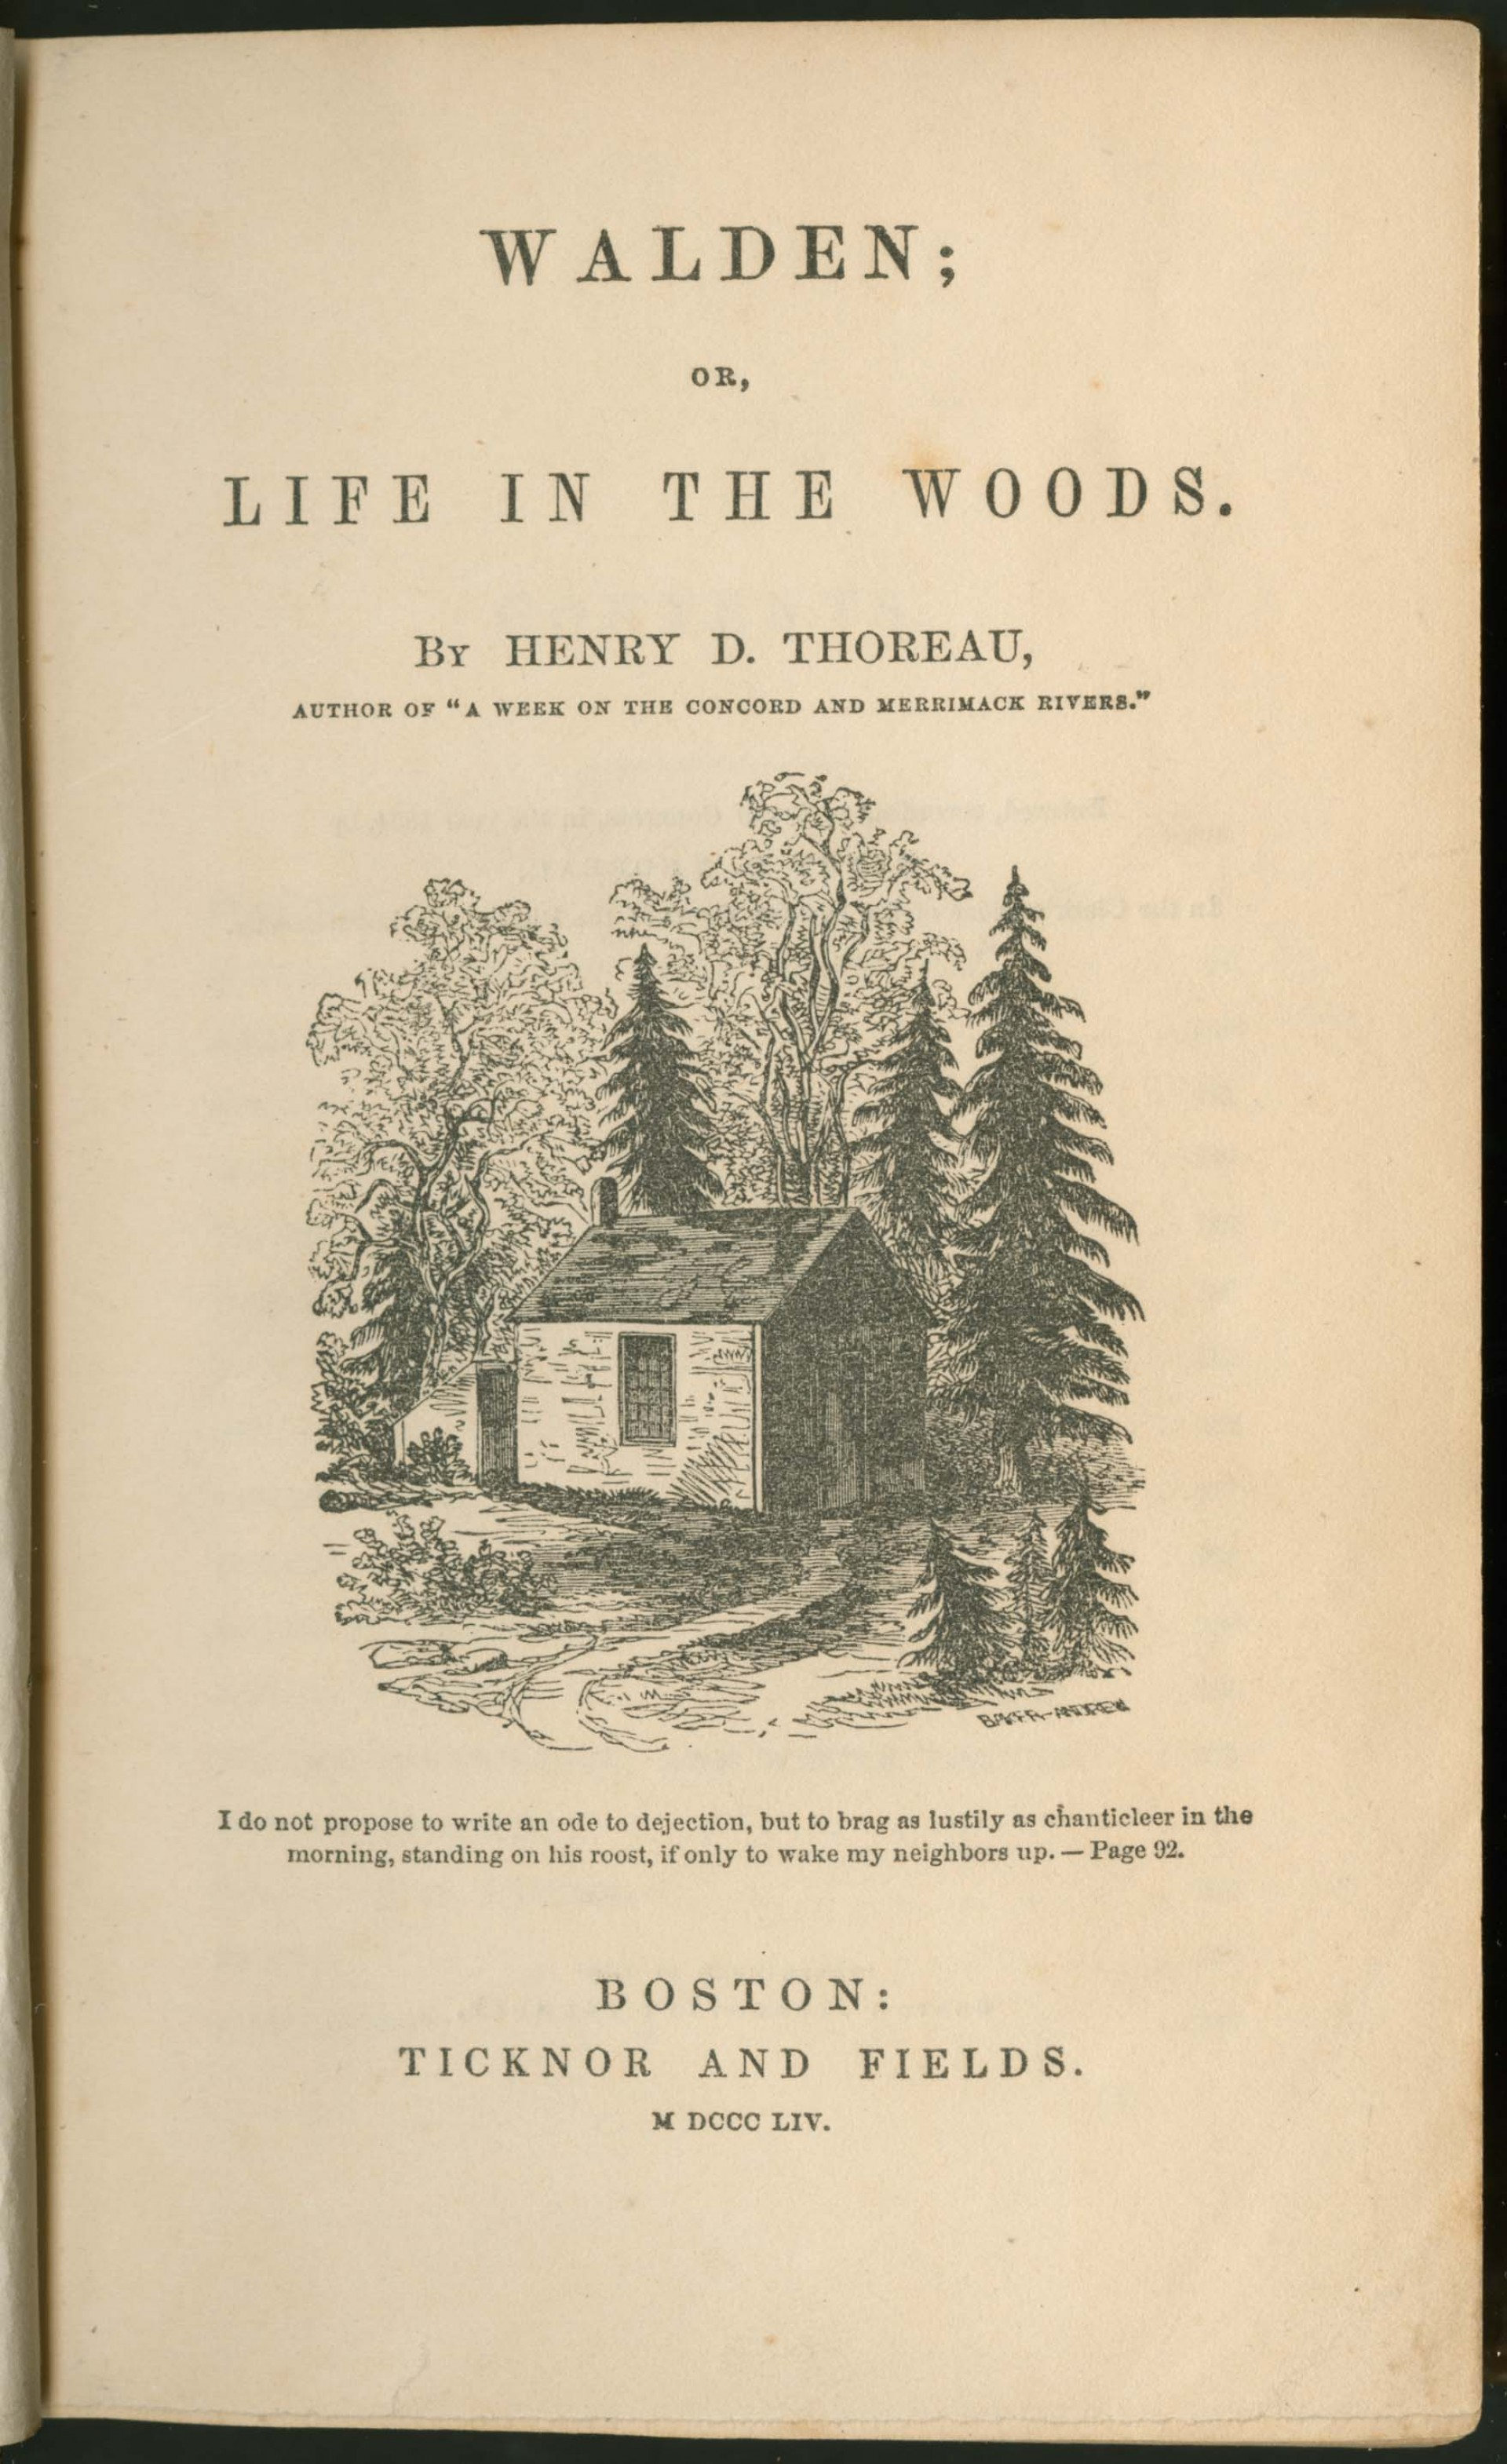 014 818 31 W14 1854 Tp Emerson Essays Essay Dreaded Ralph Pdf First Series Summary Waldo Nature 1920